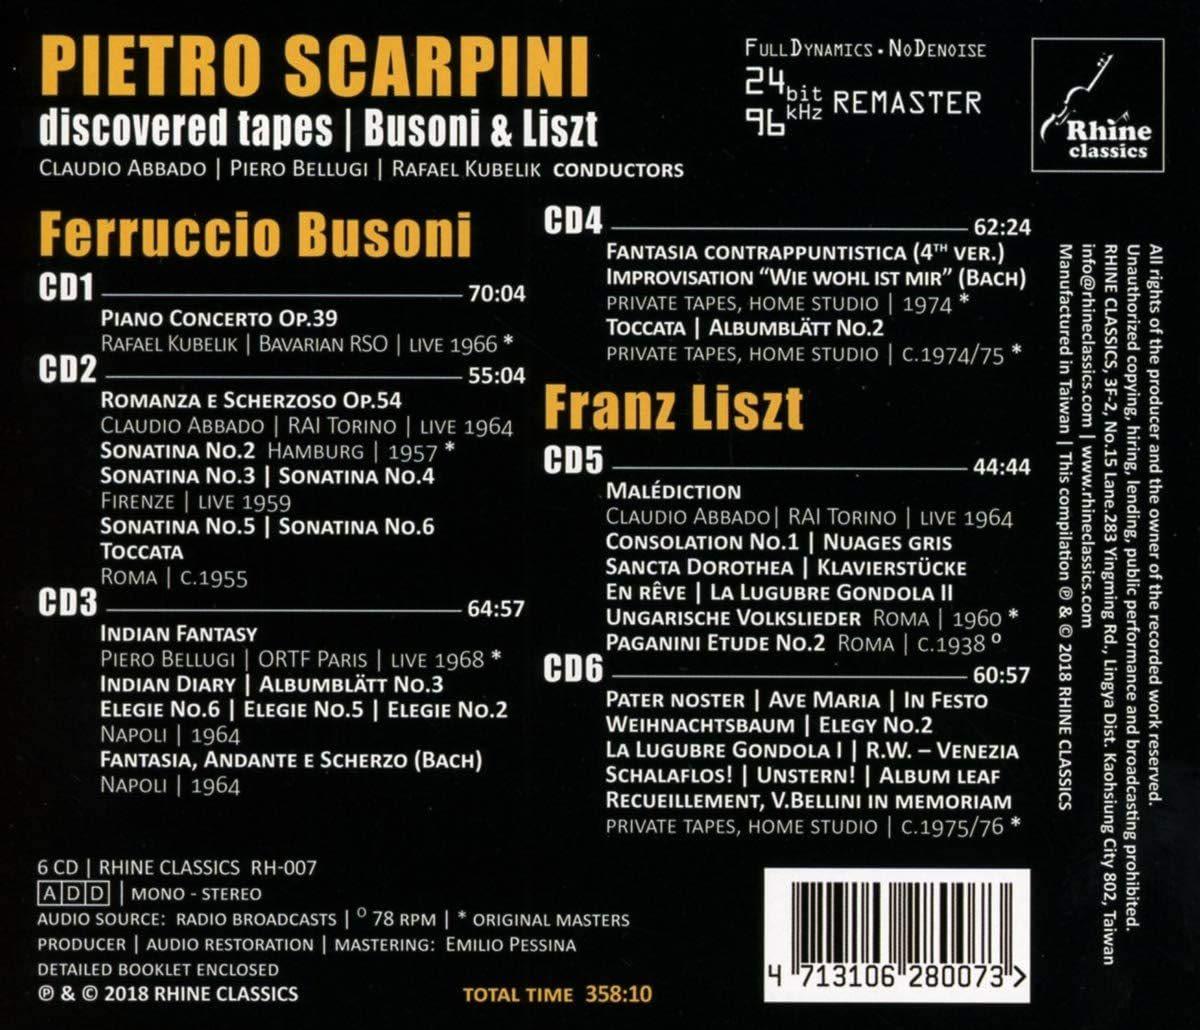 Photo No.2 of Pietro Scarpini: Discovered Tapes - Busoni and Liszt